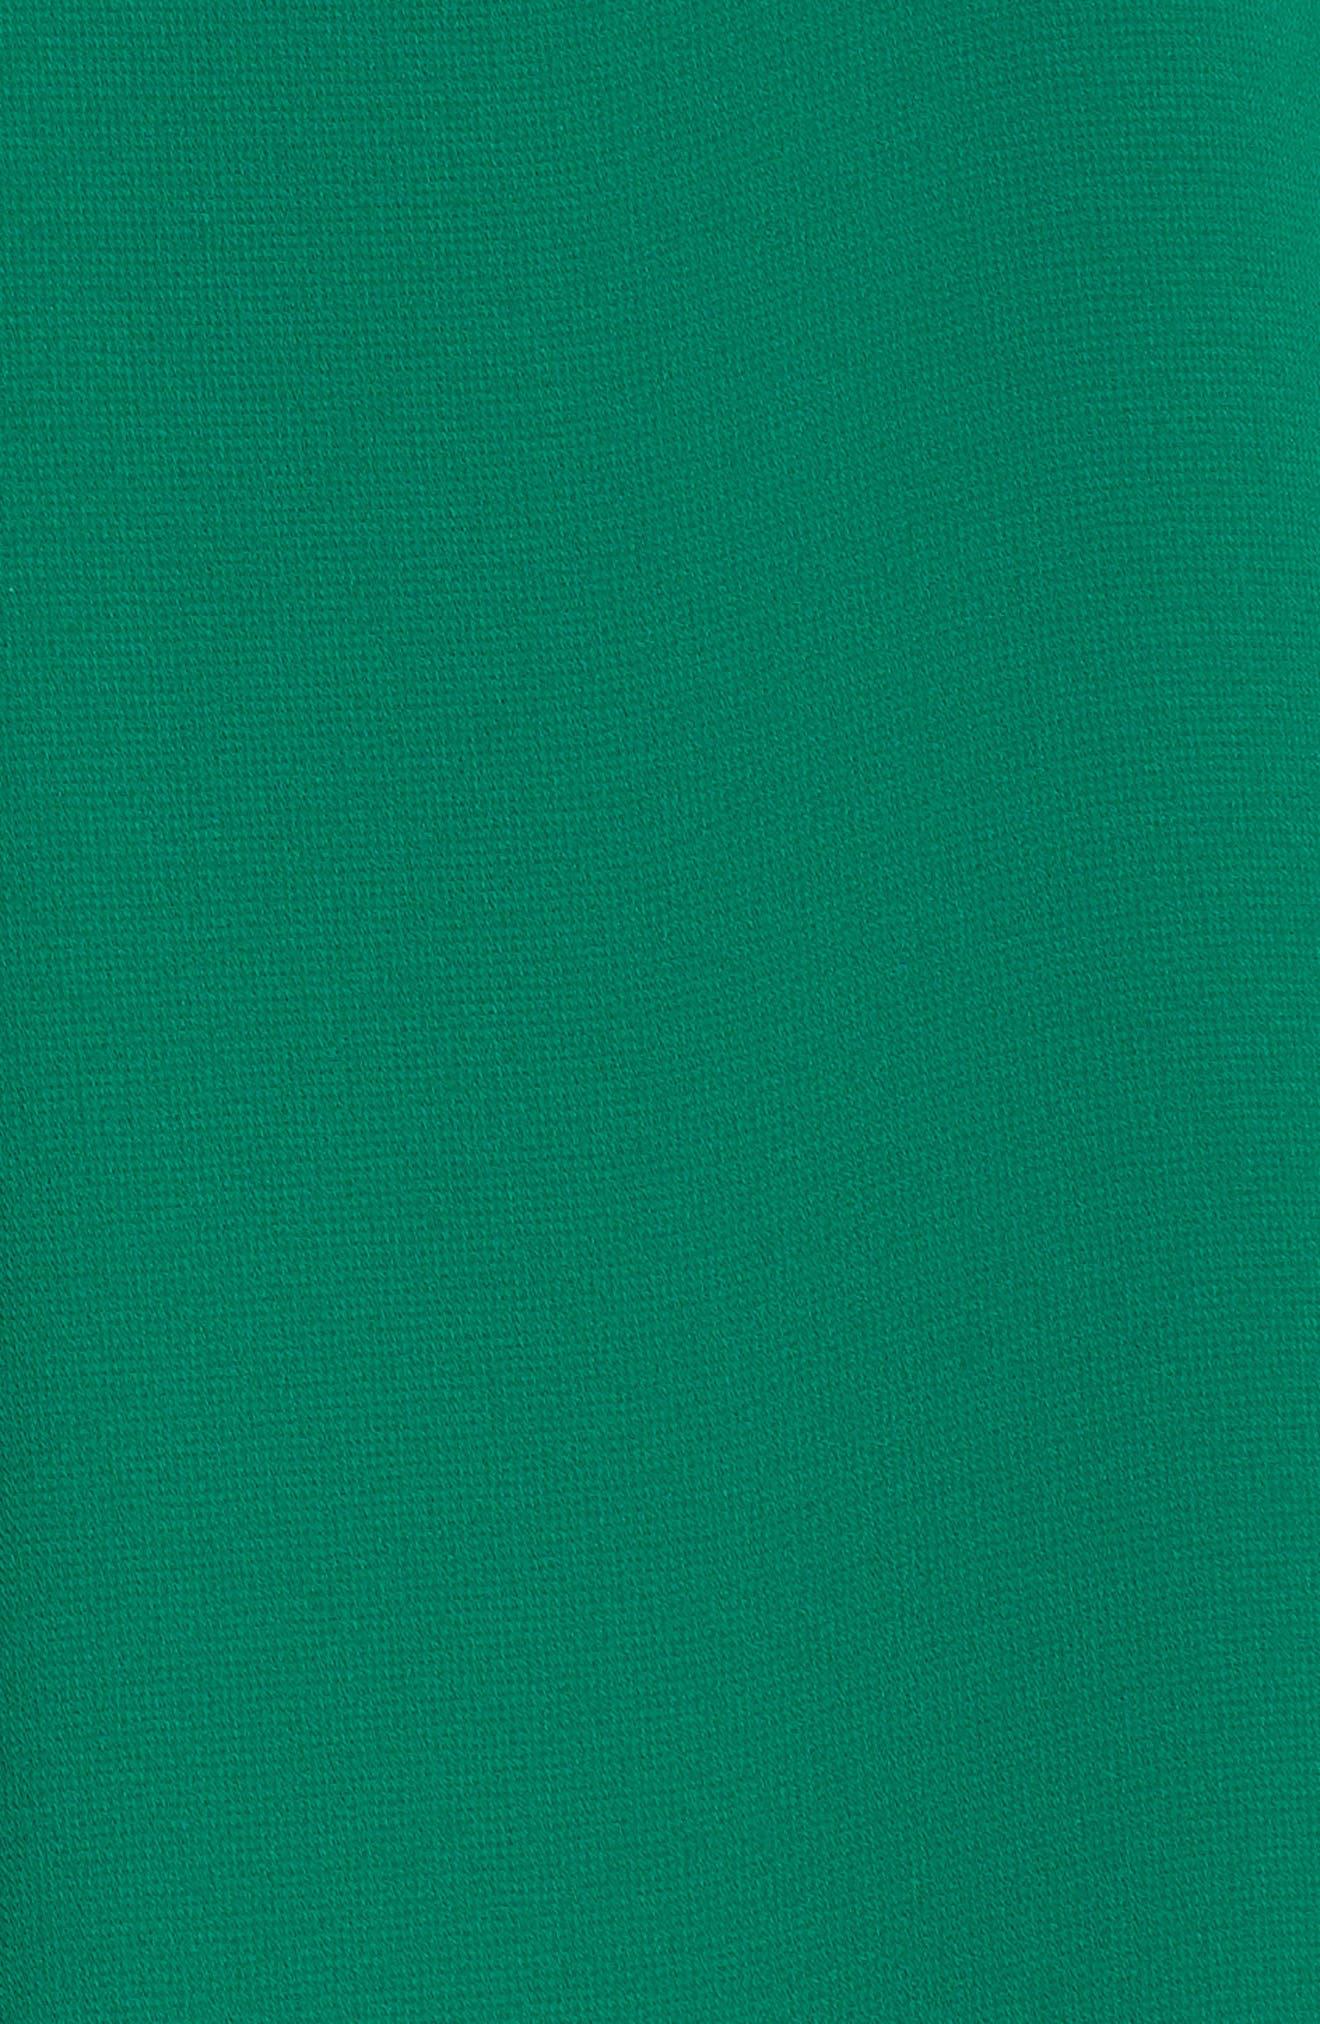 Soufflé V-Neck Chiffon Dress,                             Alternate thumbnail 6, color,                             310